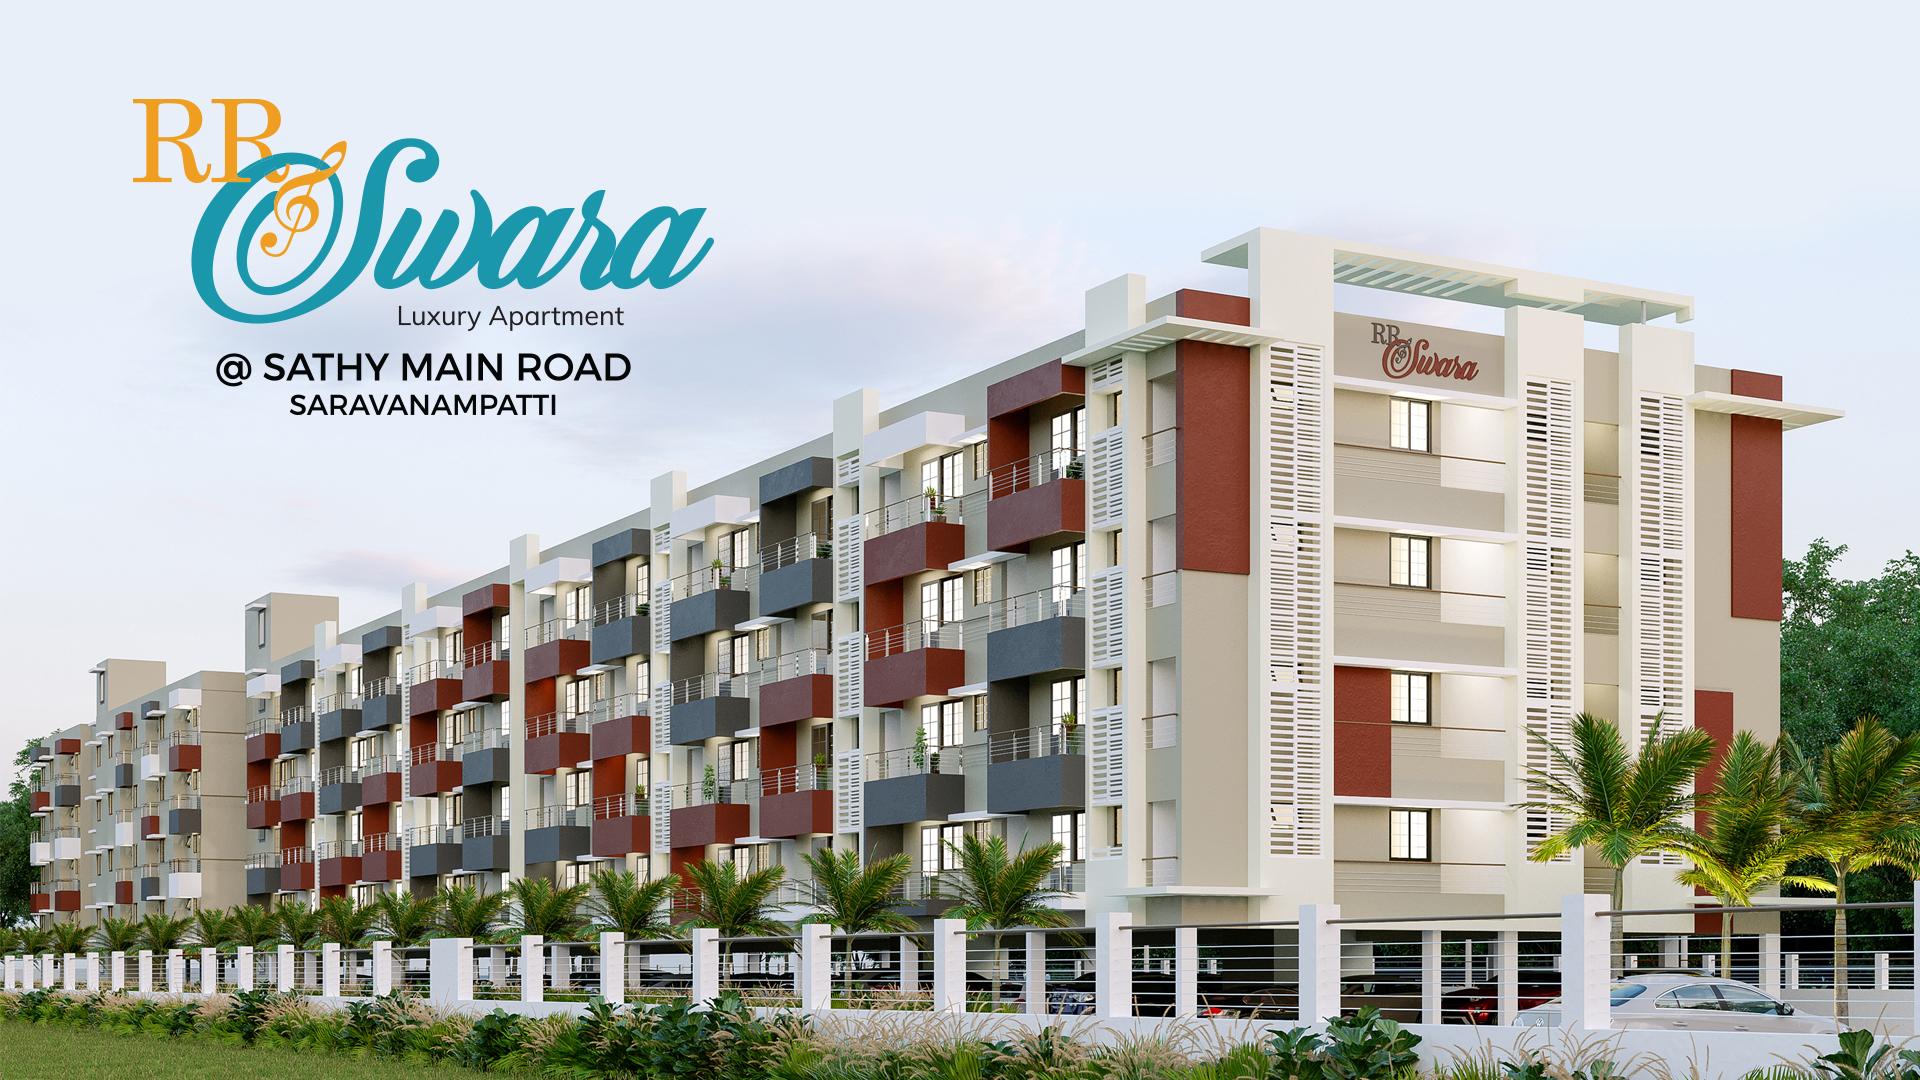 RR Swara Luxury Apt Saravanampatti